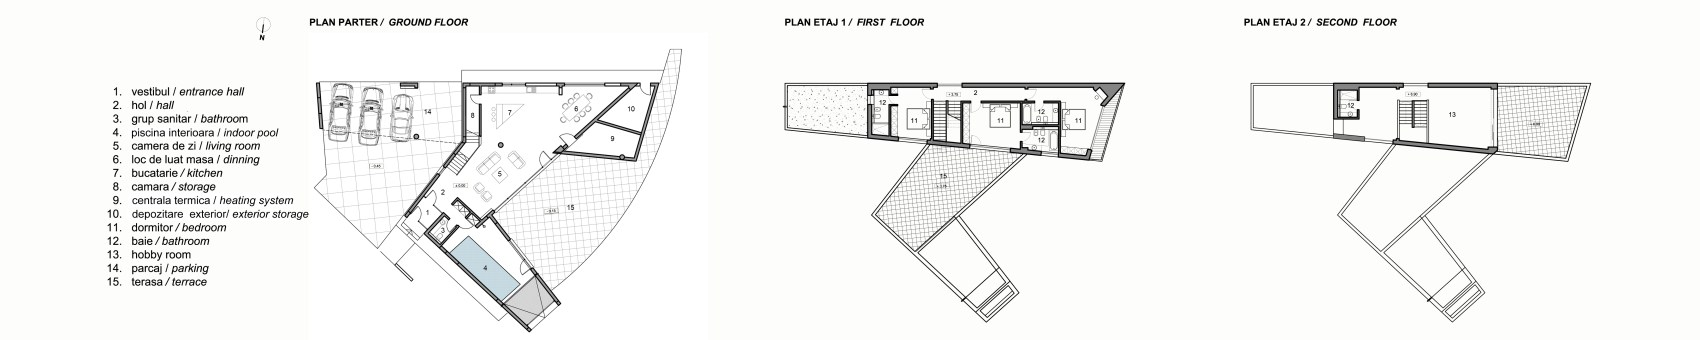 https://nbc-arhitect.ro/wp-content/uploads/2020/11/NBC-Arhitect-_-residences-_-Zamora-Villa-_-Romania-_-plans_4.jpg